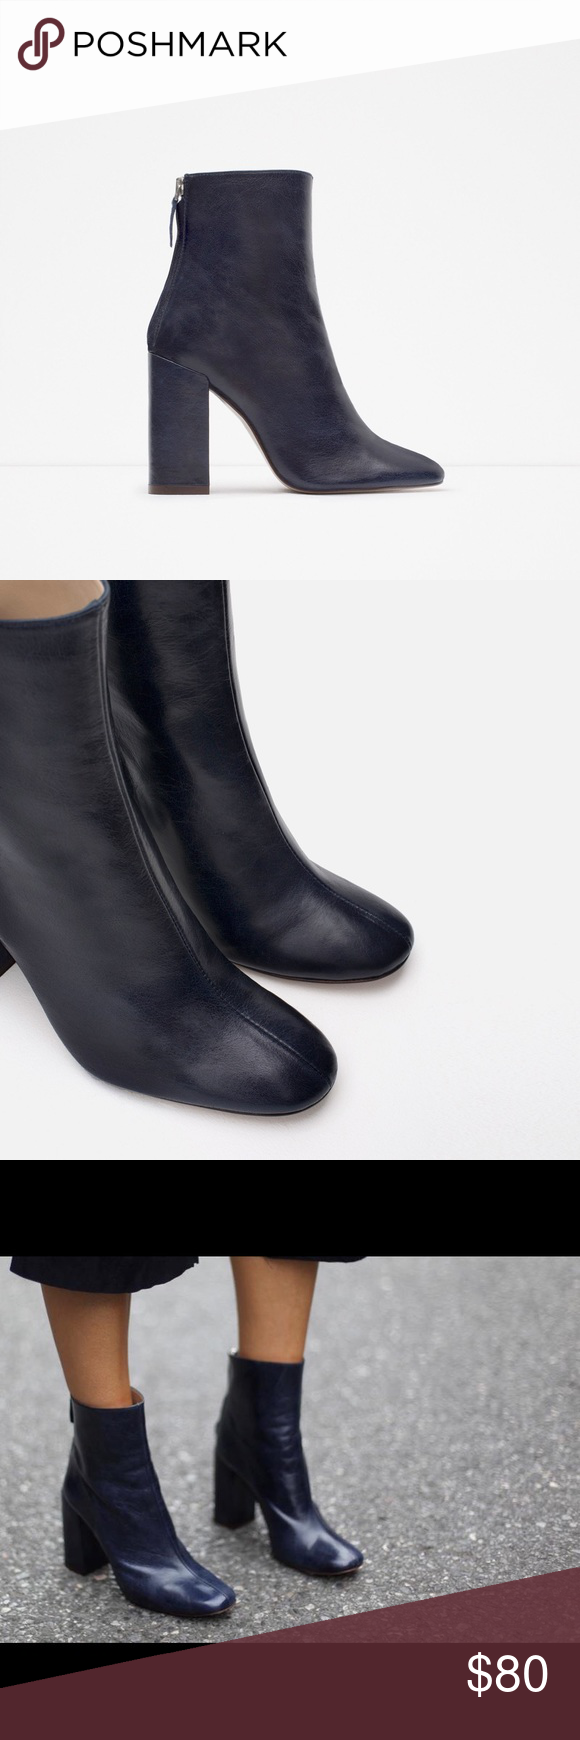 ba04c6fe17 Zara Navy Blue Leather Block Heel Ankle Boot -Italian leather ankle ...